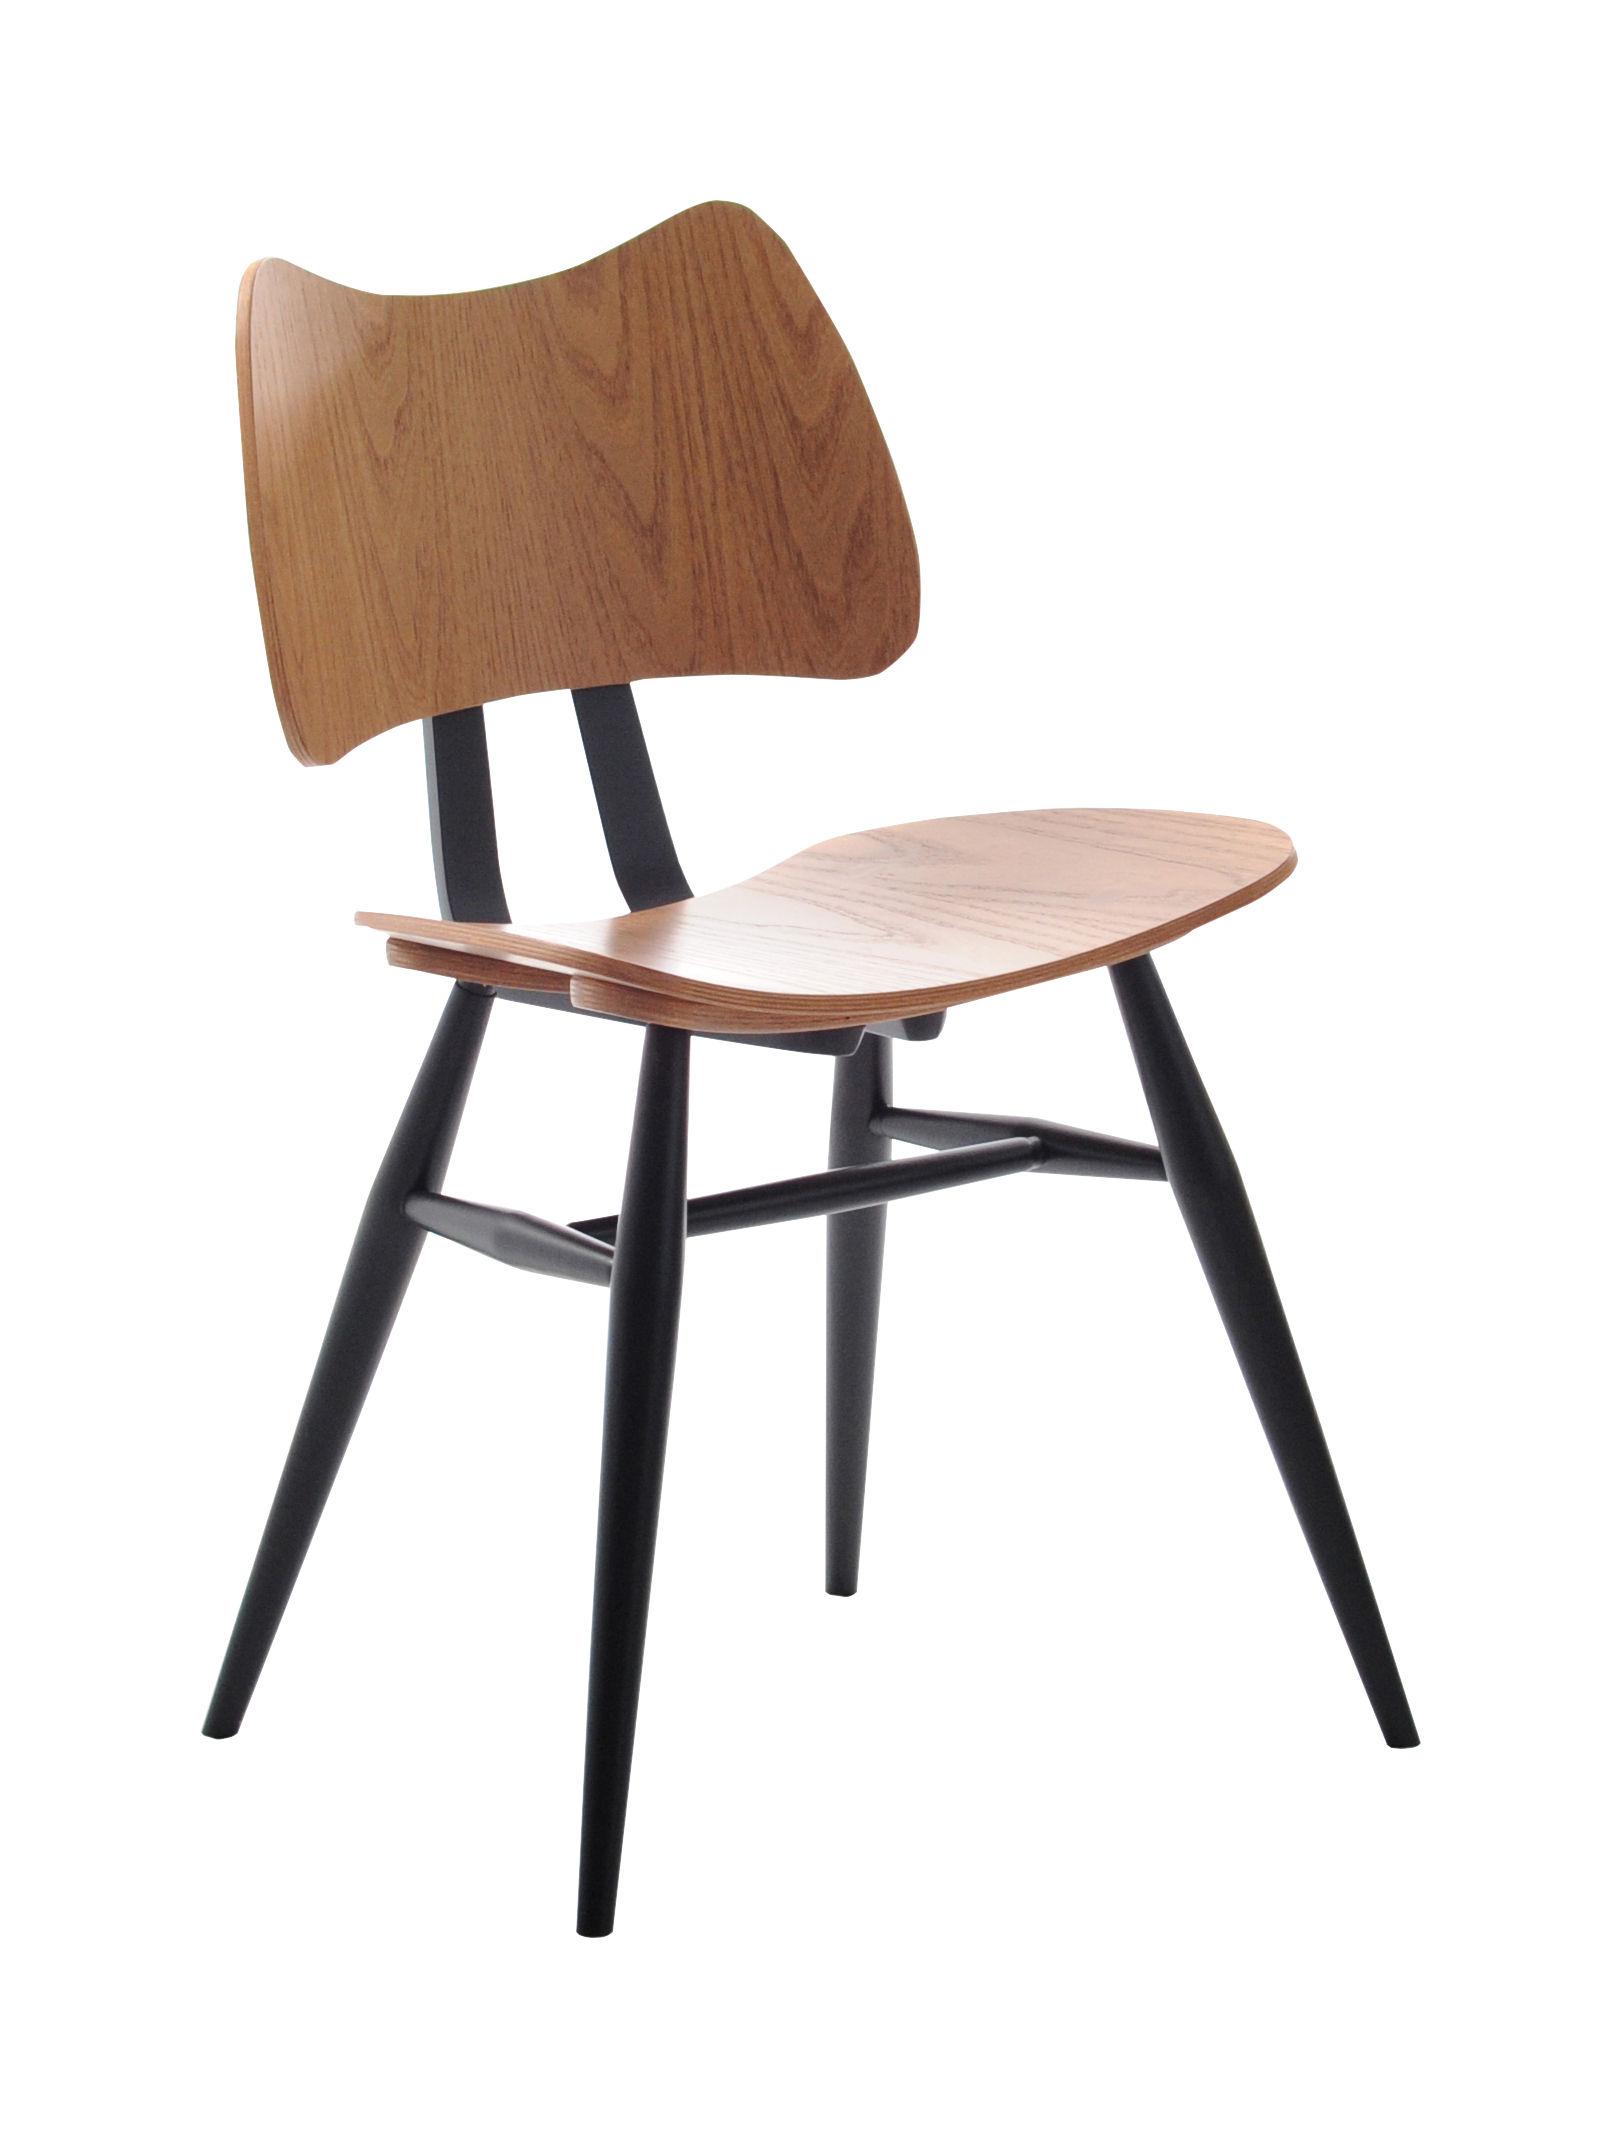 chaise butterfly bois r dition 1958 noir bois ercol. Black Bedroom Furniture Sets. Home Design Ideas